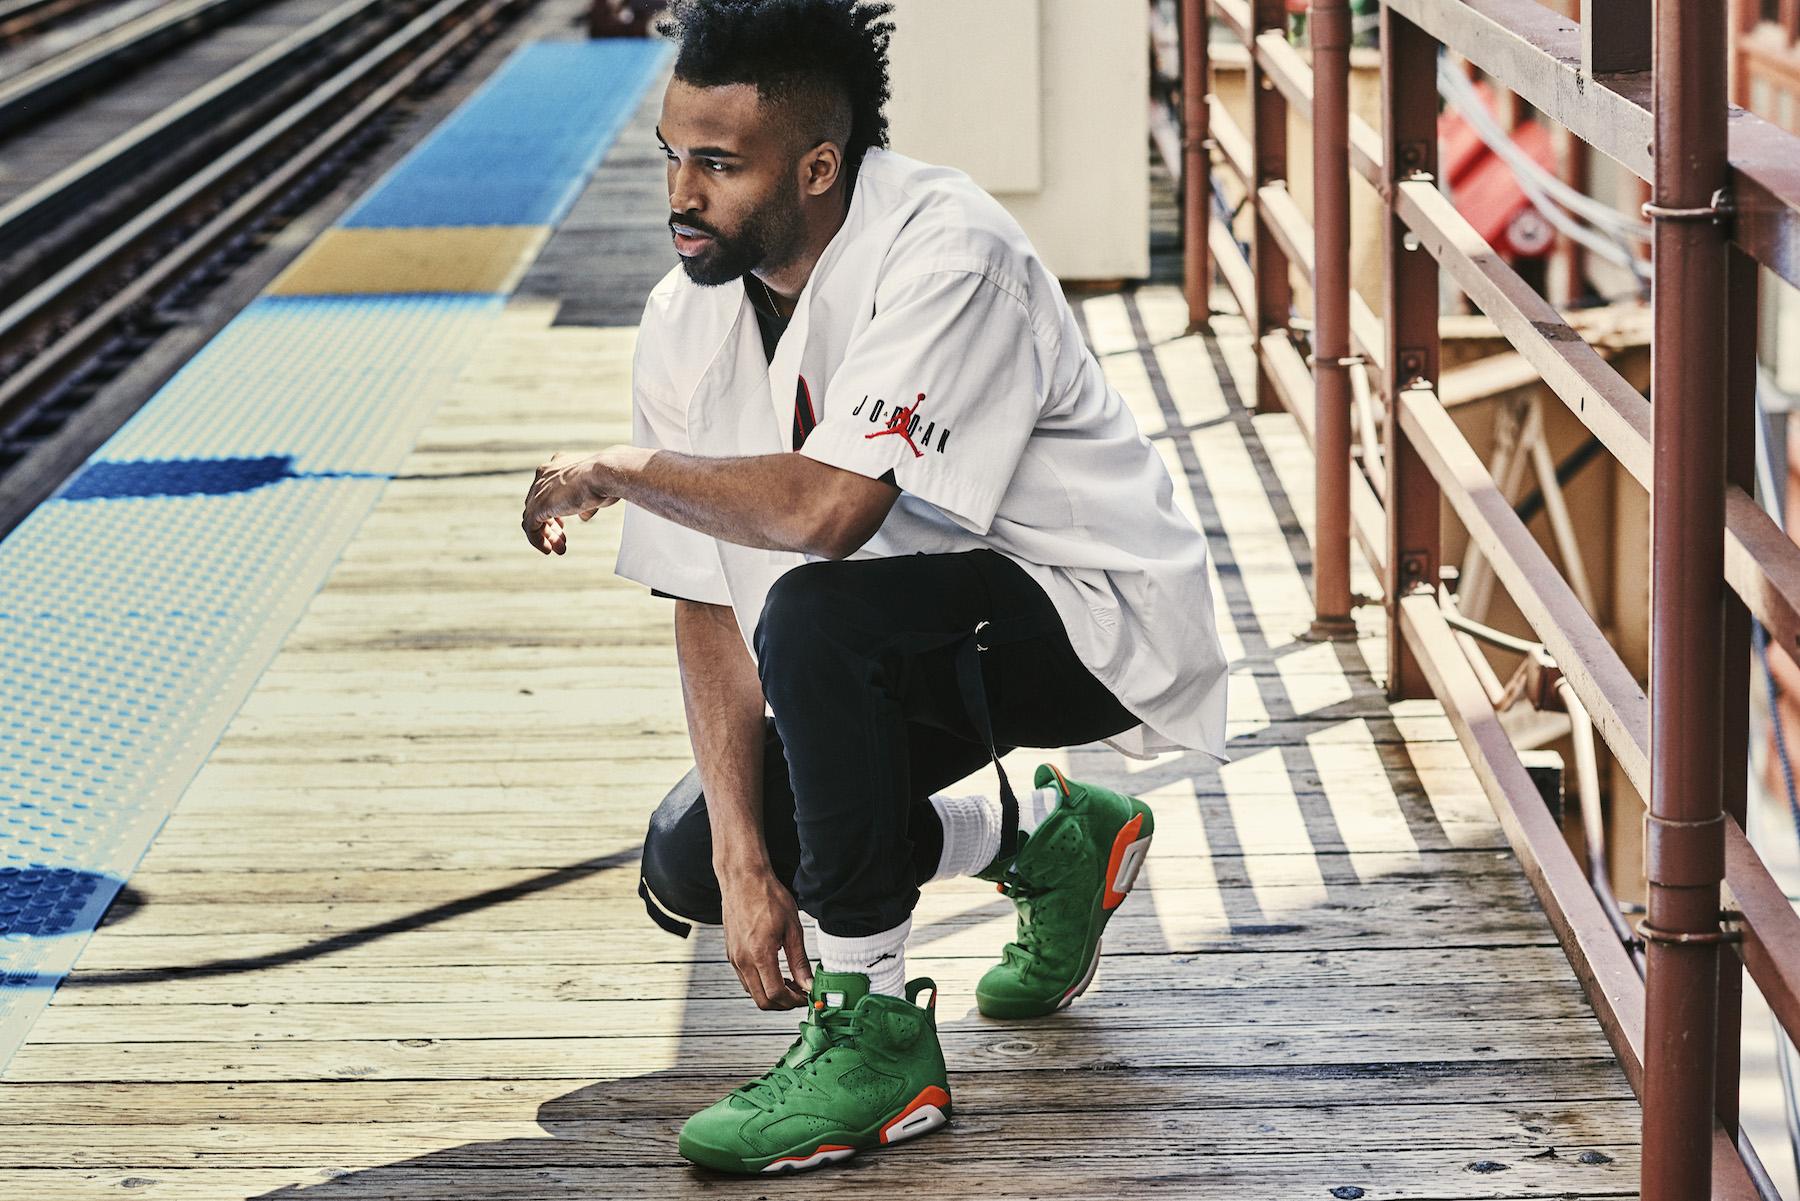 b73ce1a1e55341 Jordan Brand   Kicks On Court   Retro Lifestyle ...